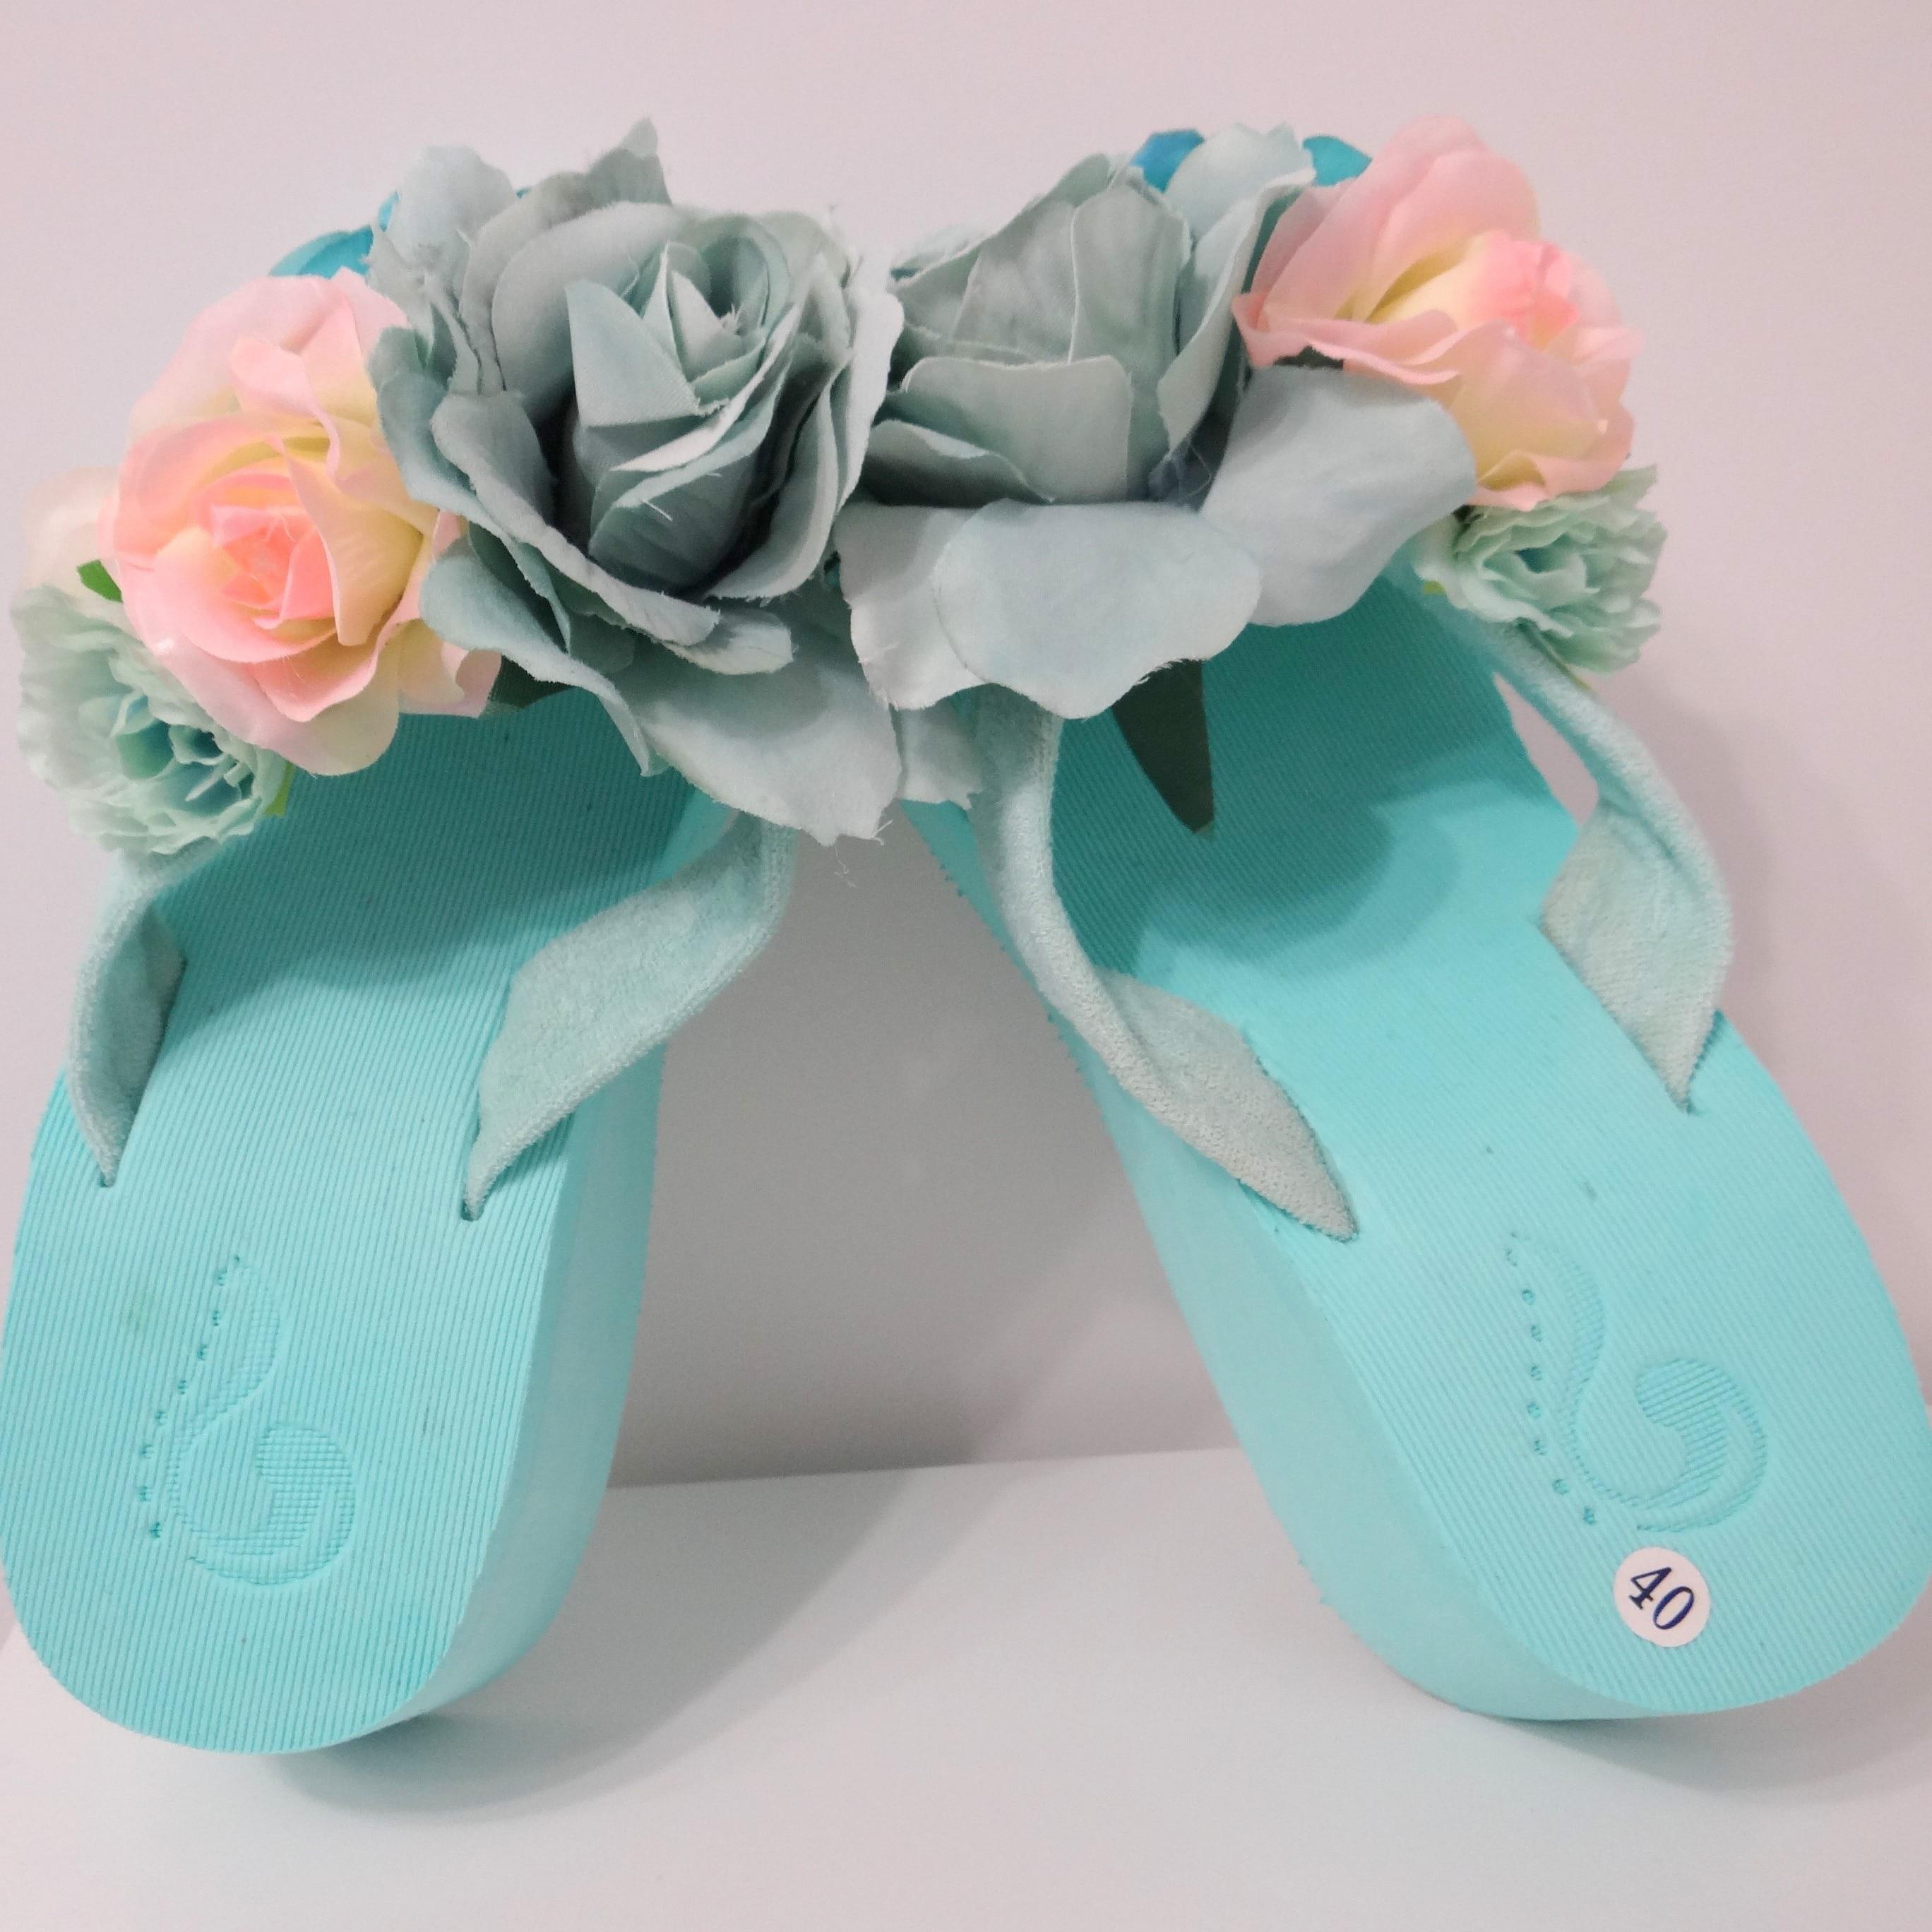 8eca4eb8e HTUUA 2017 New Summer Slippers Women Fashion Flip Flops Beach ...